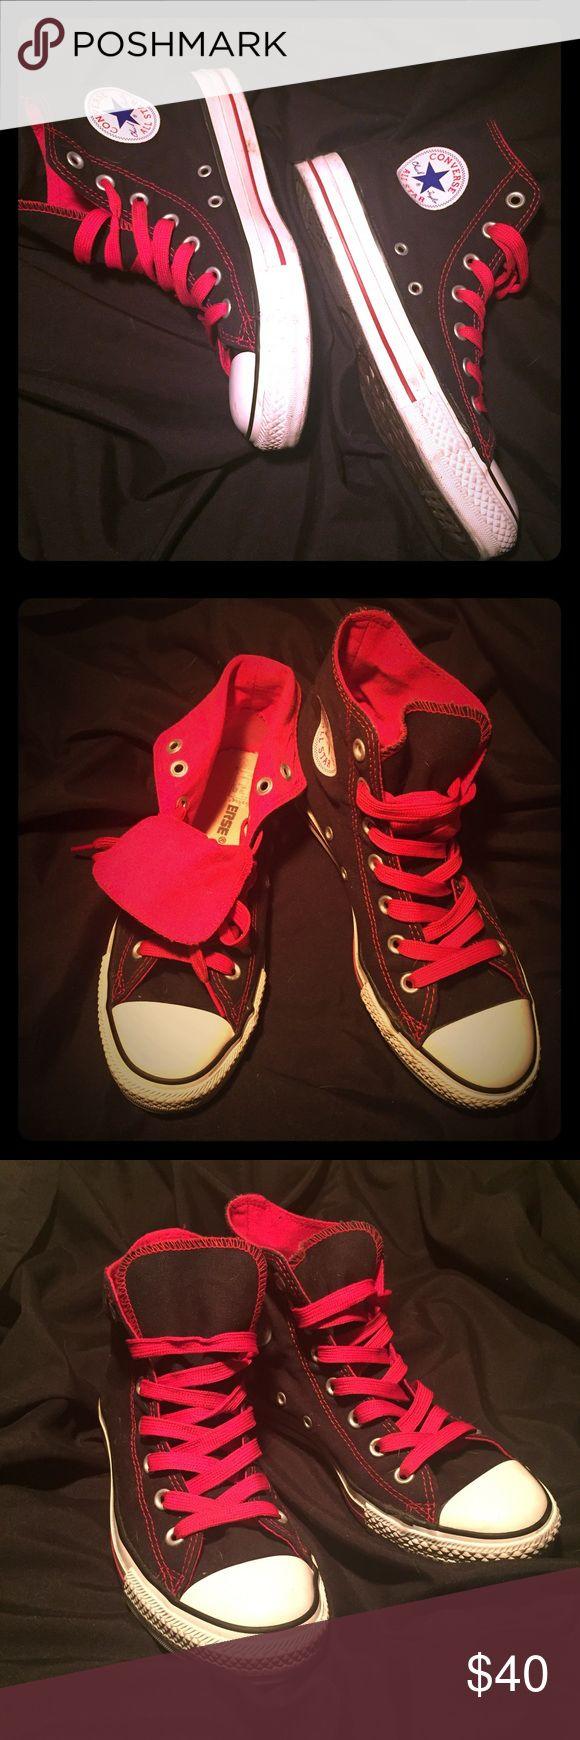 Converse/Chuck Taylor's hi tops size 6= women's 8 Converse/ Chuck Taylor's hi tops- black and red. Size 6 men's, size 8 women's (fit 8.5 also). Excellent condition/worn a couple times. Converse Shoes Sneakers